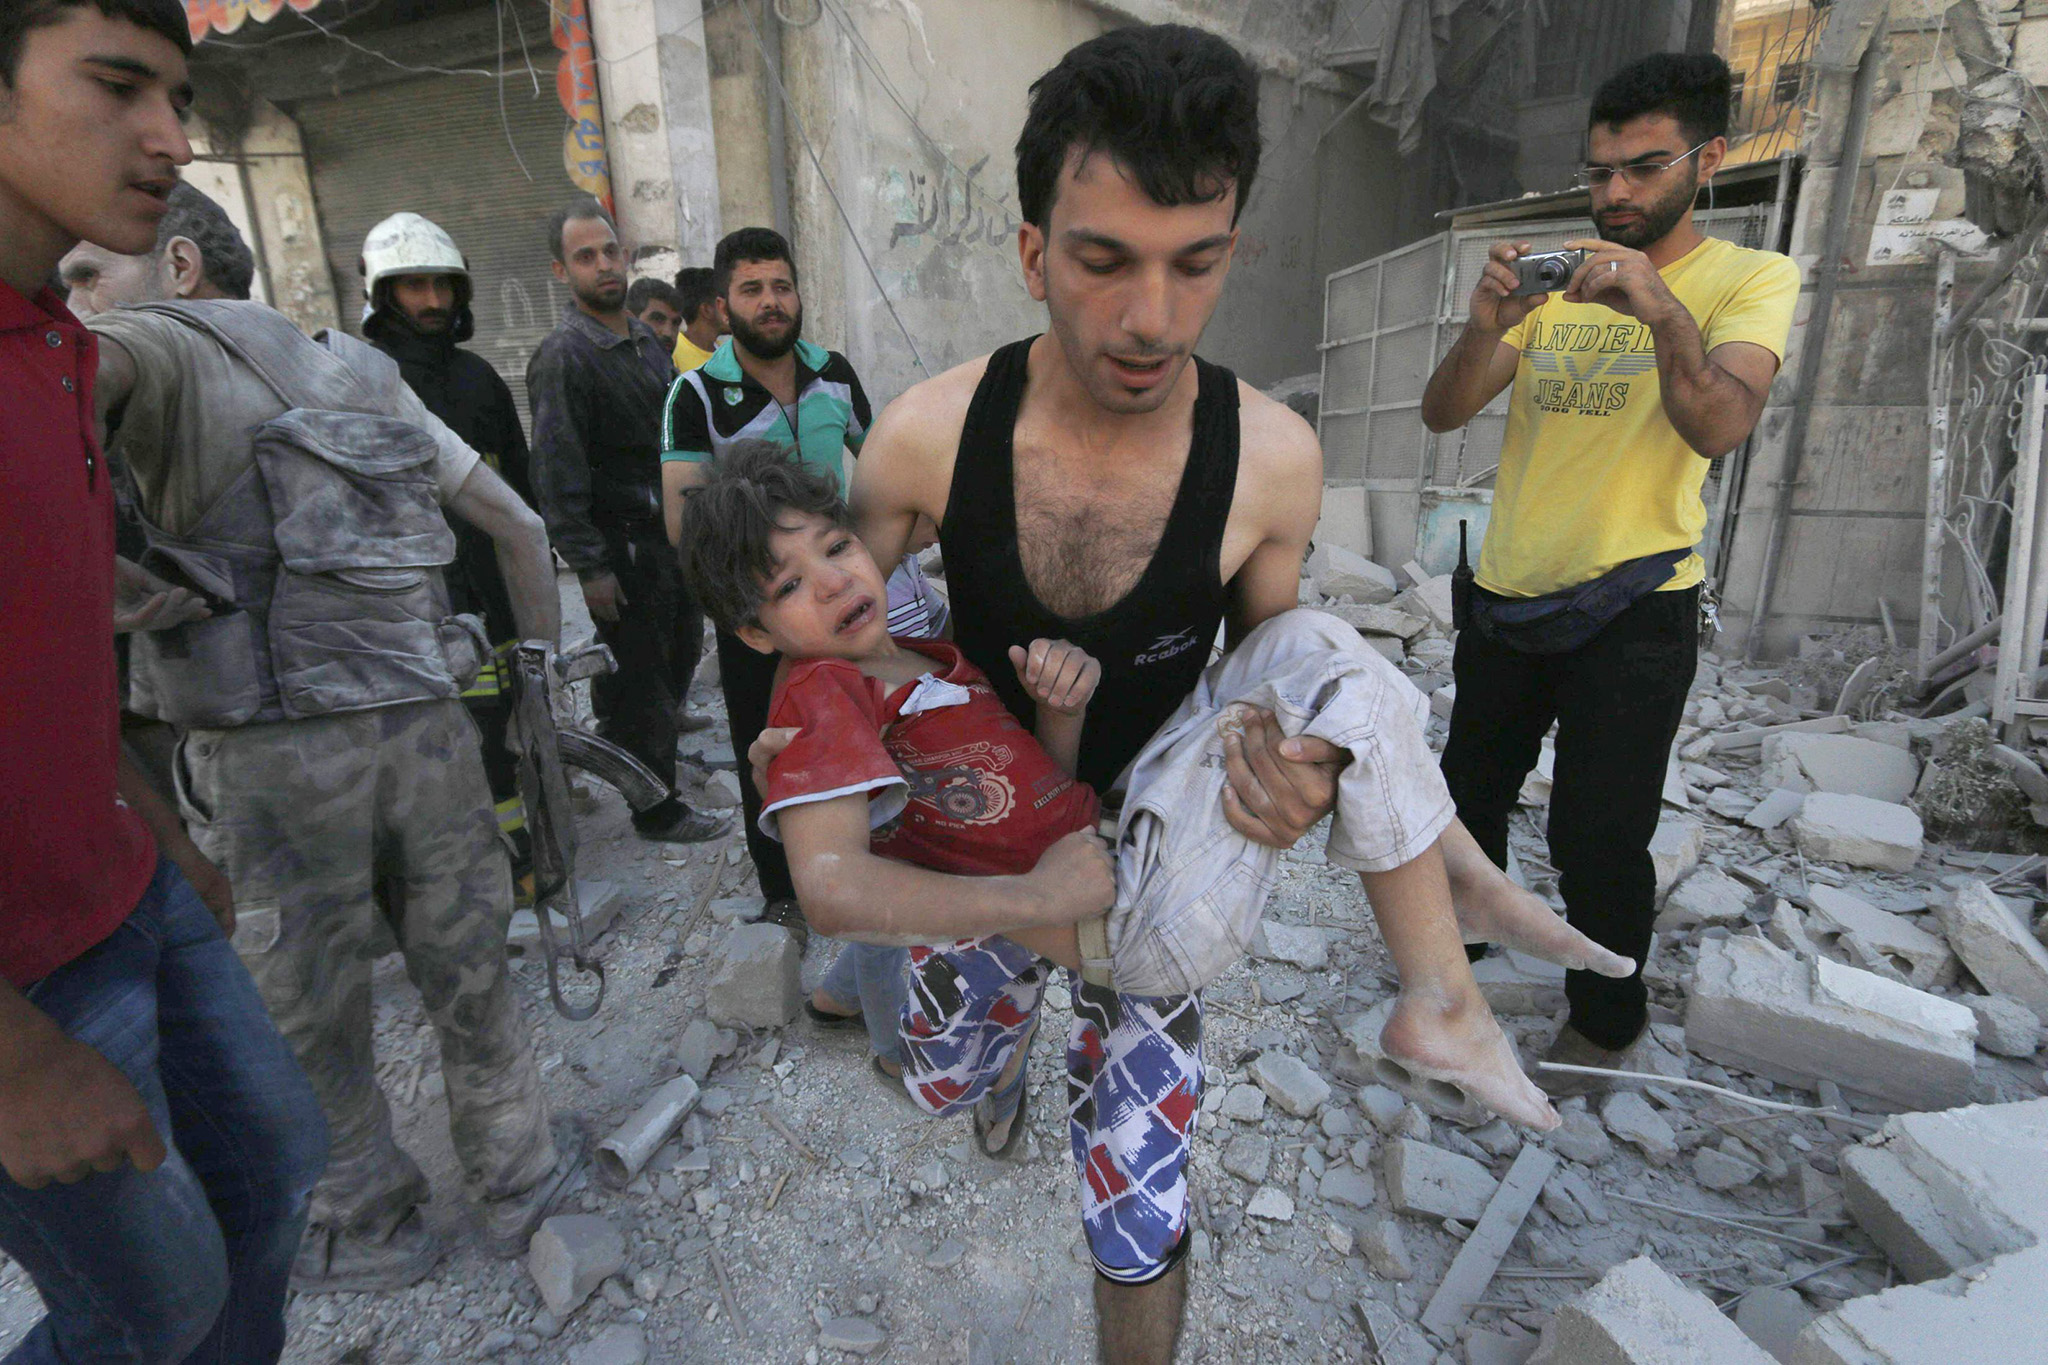 The Regime's Barrel Bombs on Rebel-Held Areas Kill Thousands, Syria: The Regime's Barrel Bombs on Rebel-Held Areas Kill Thousands